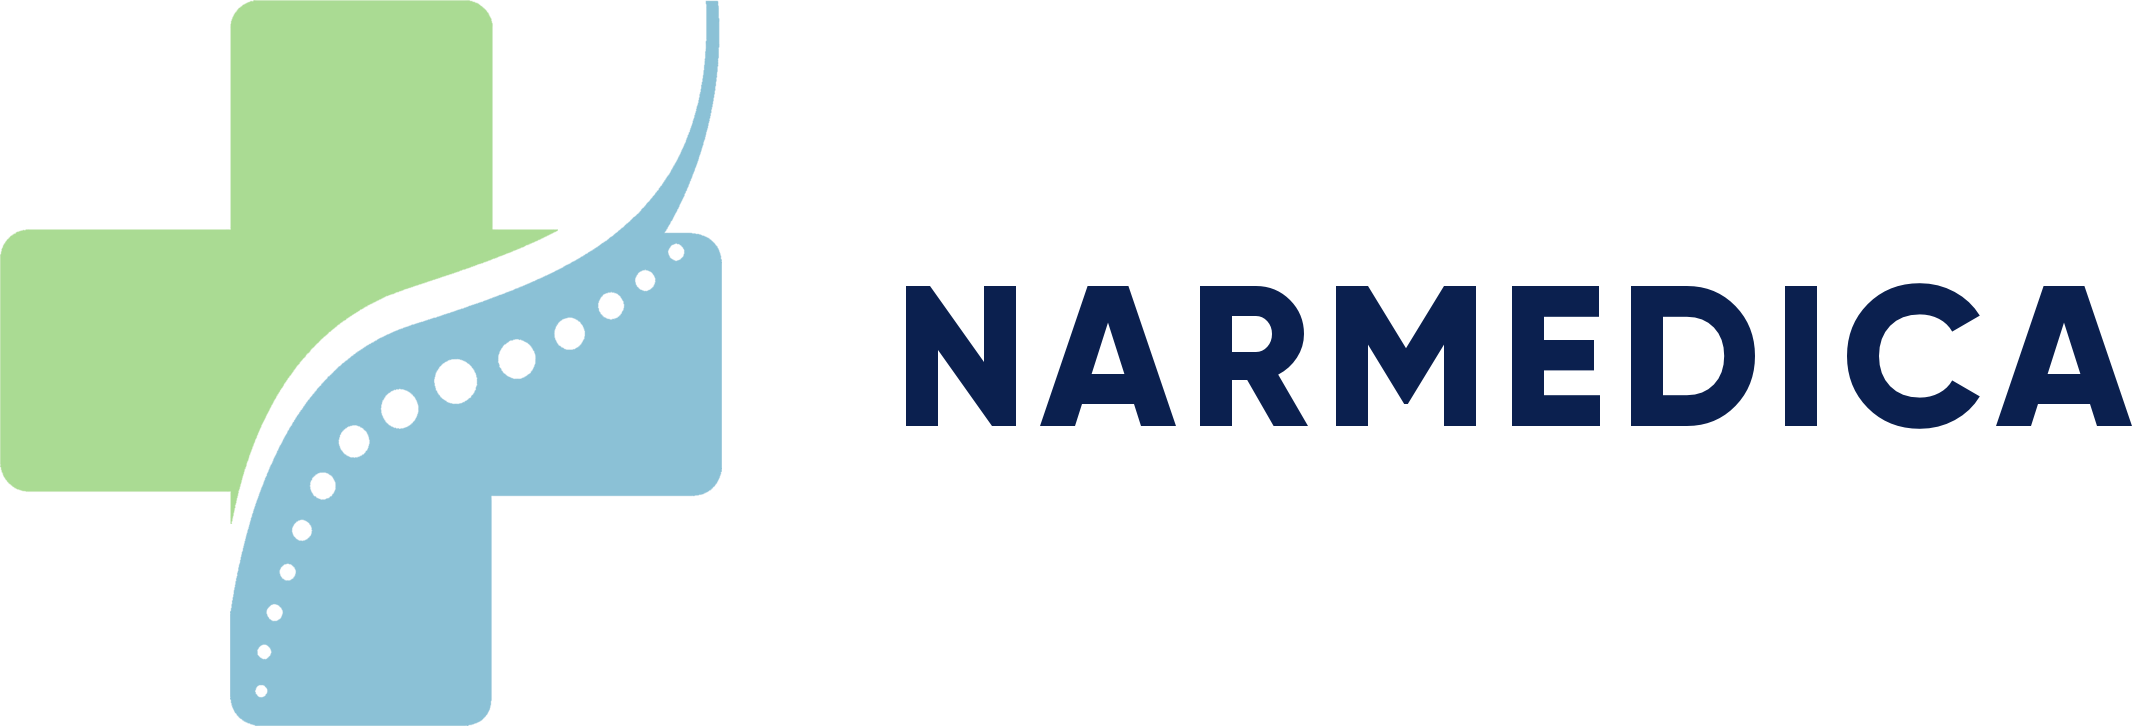 Narmedica